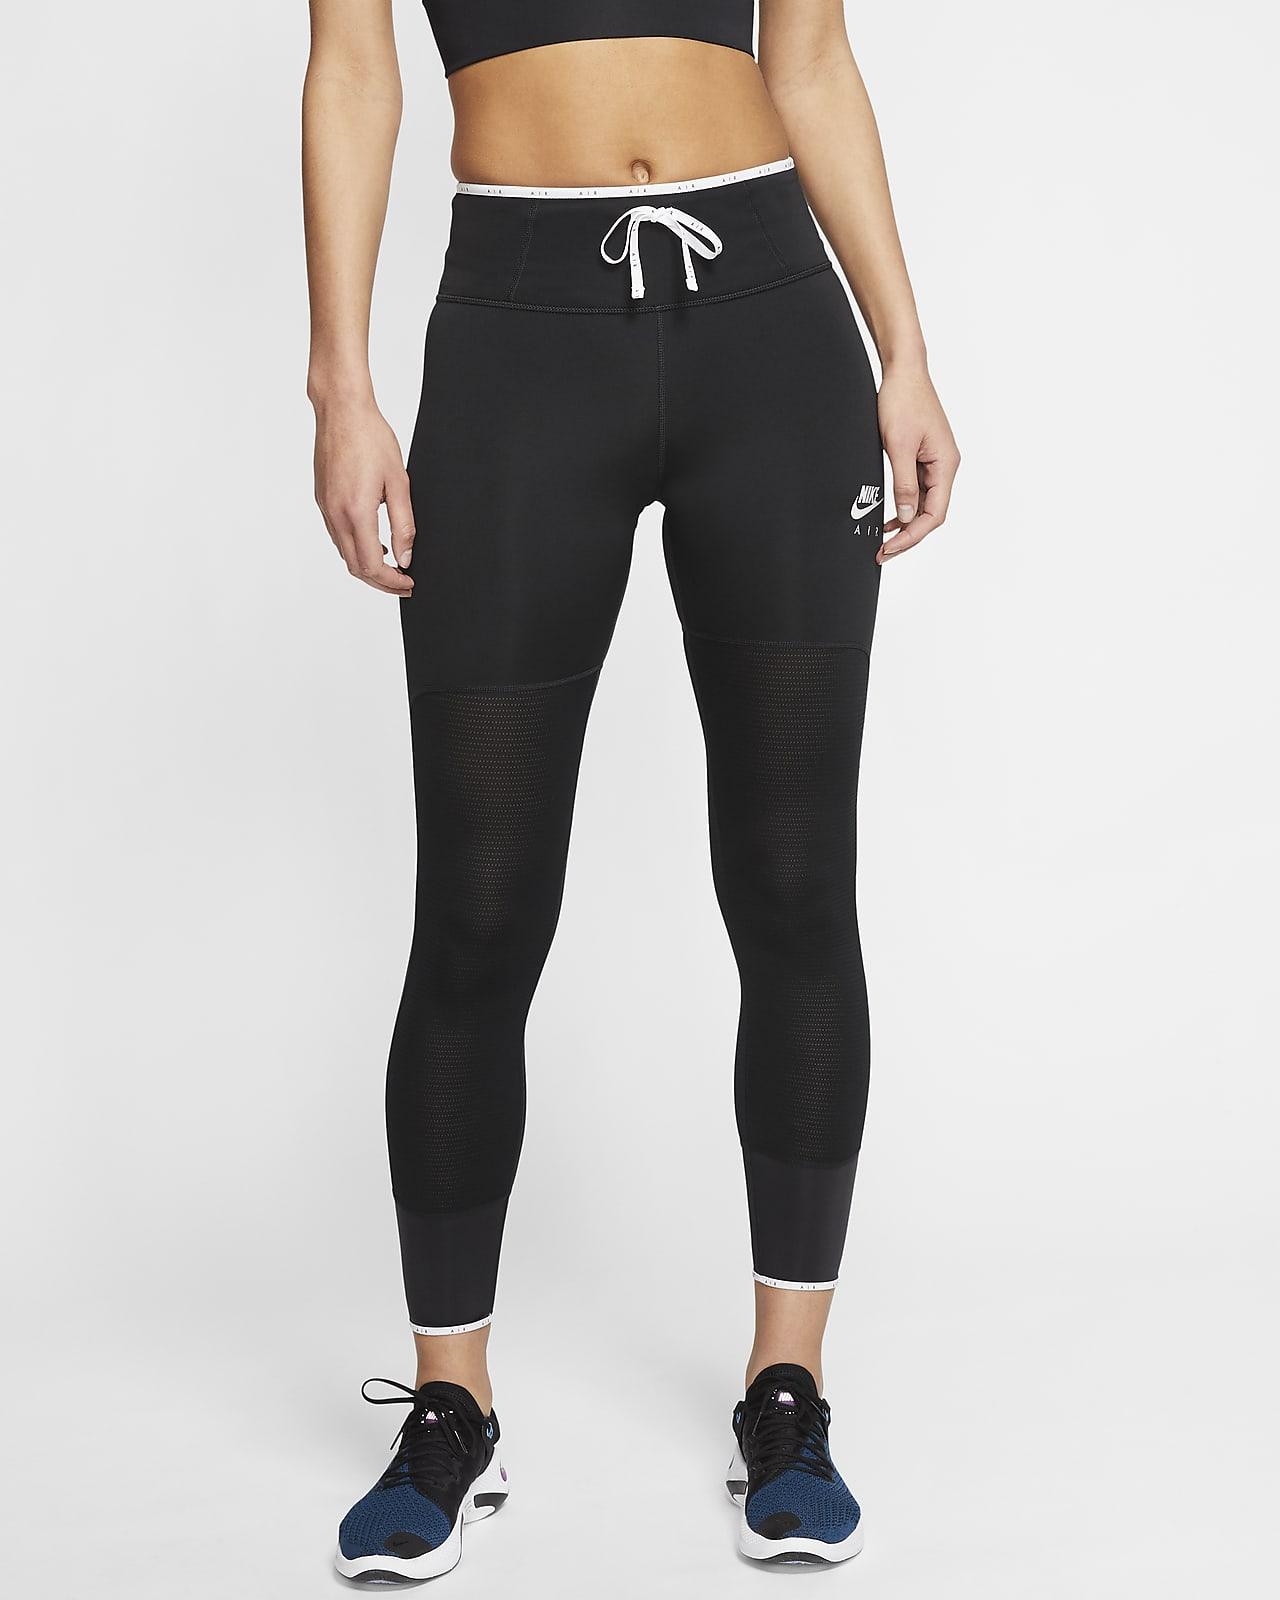 rojo riqueza carpintero  Mallas de running de 7/8 para mujer Nike Air. Nike MX